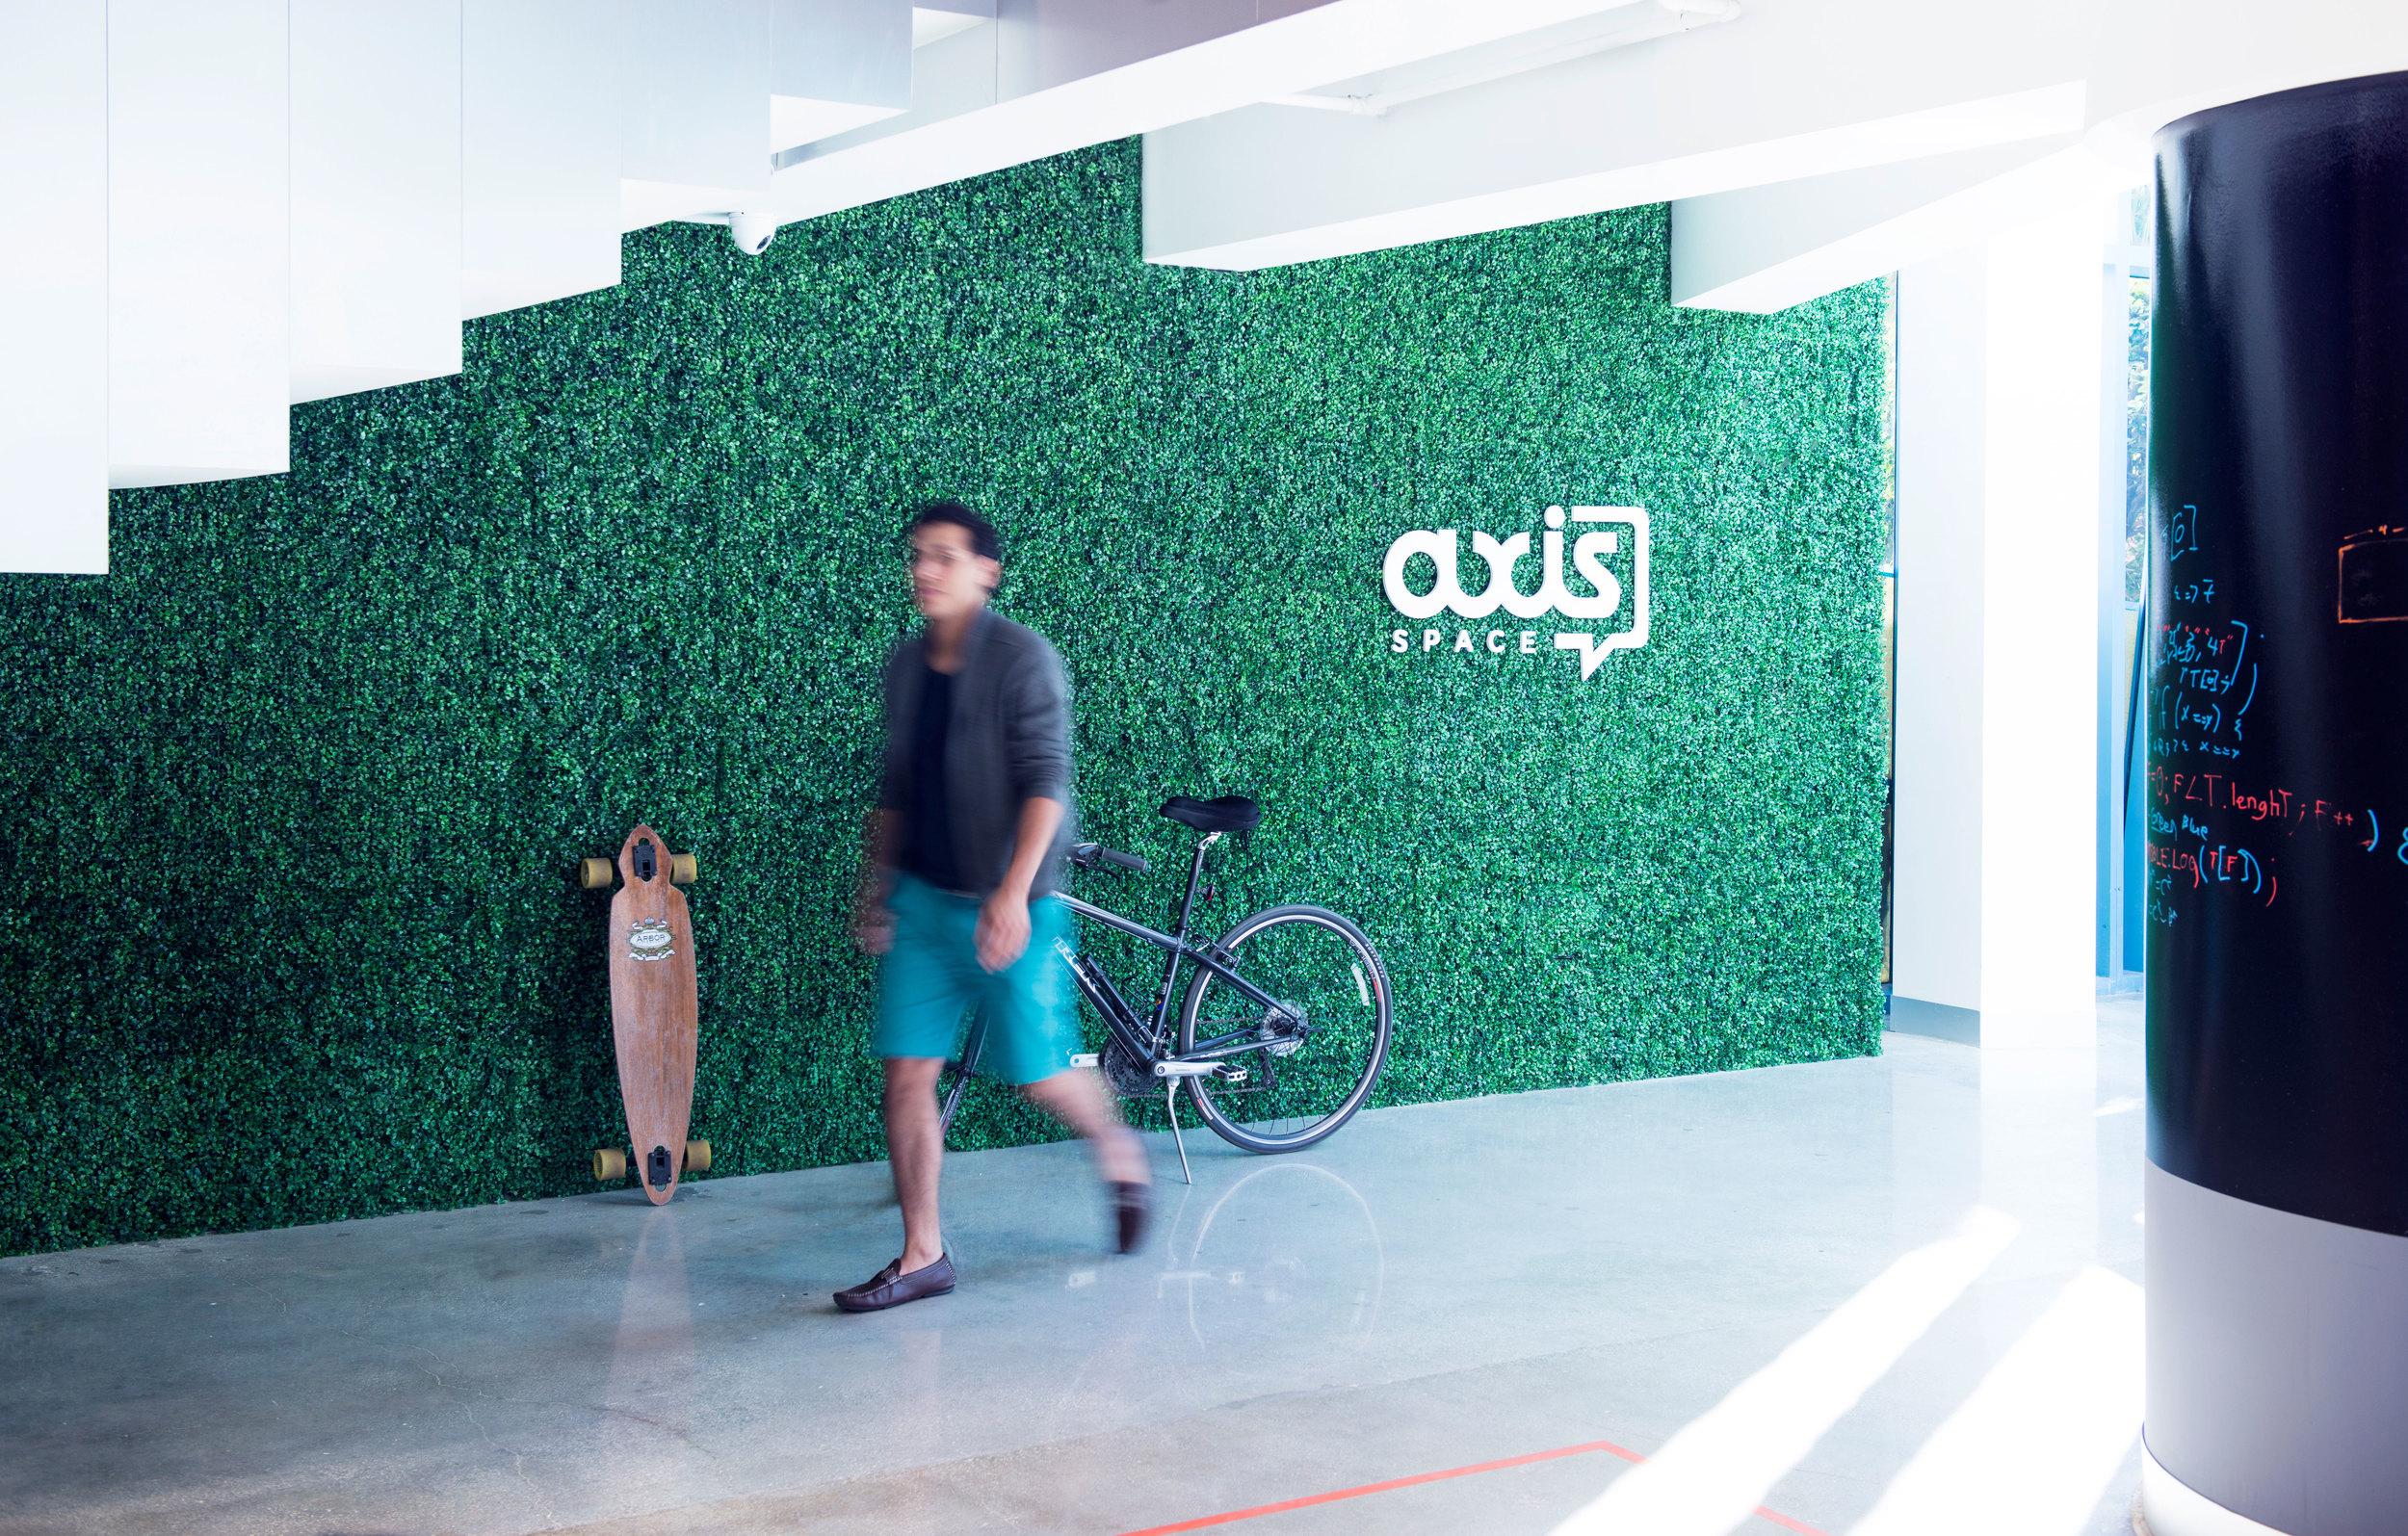 axis-space-wall.jpg